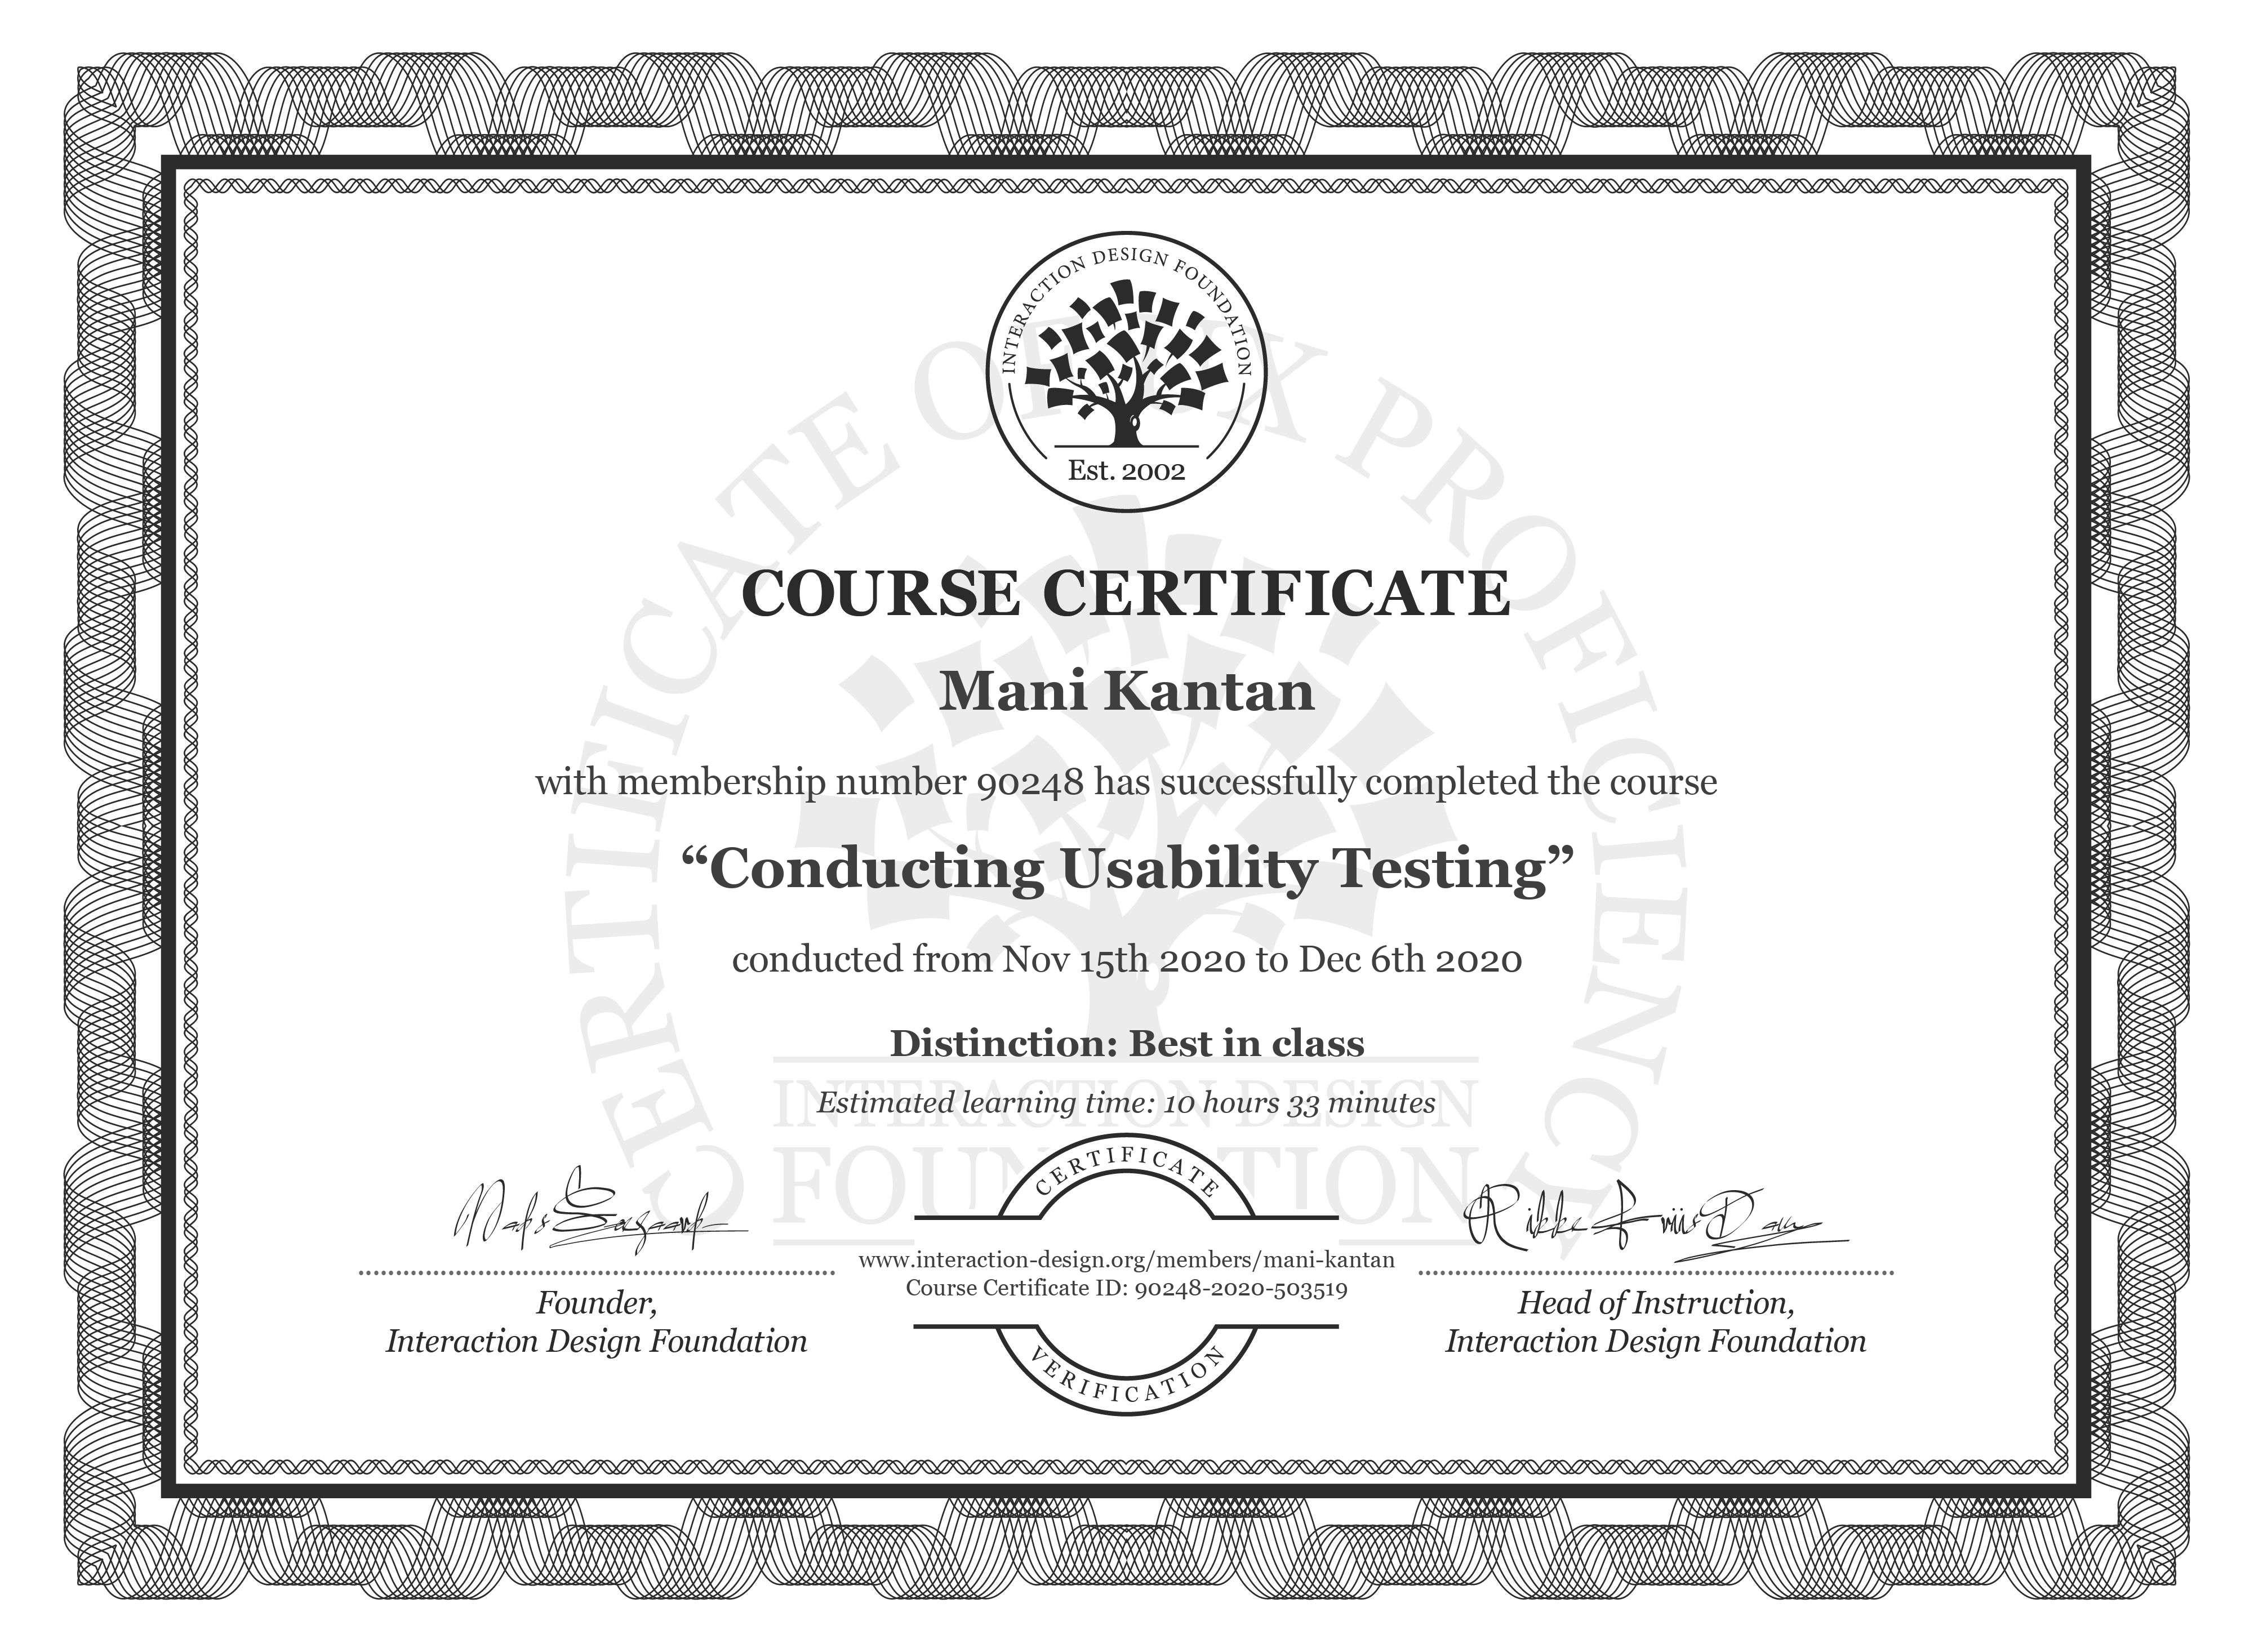 Mani Kantan's Course Certificate: Conducting Usability Testing